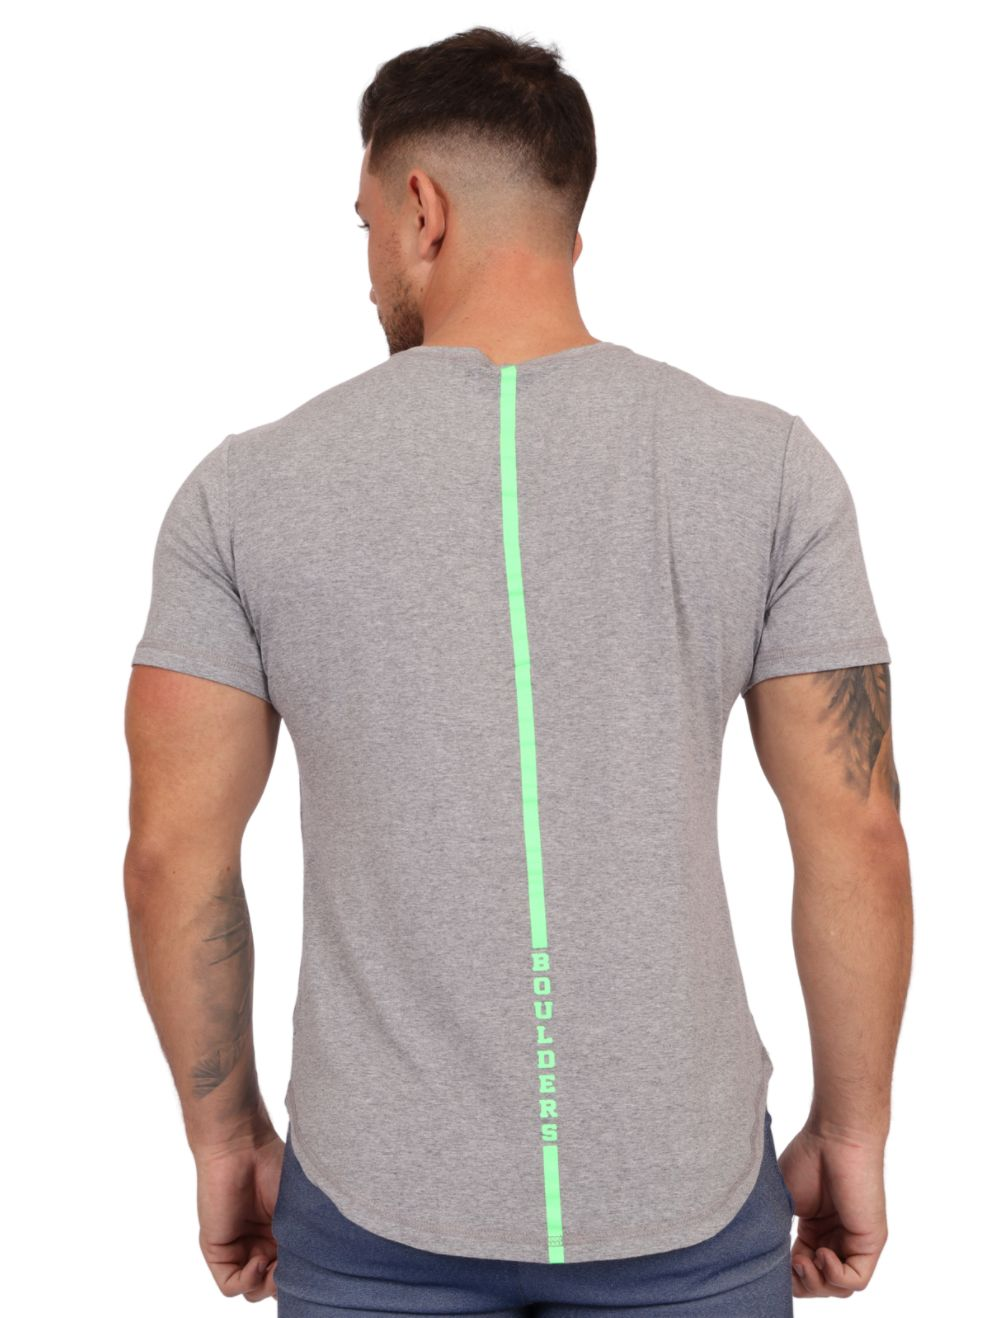 Camiseta Masculina Longline com Elastano Mescla Fit